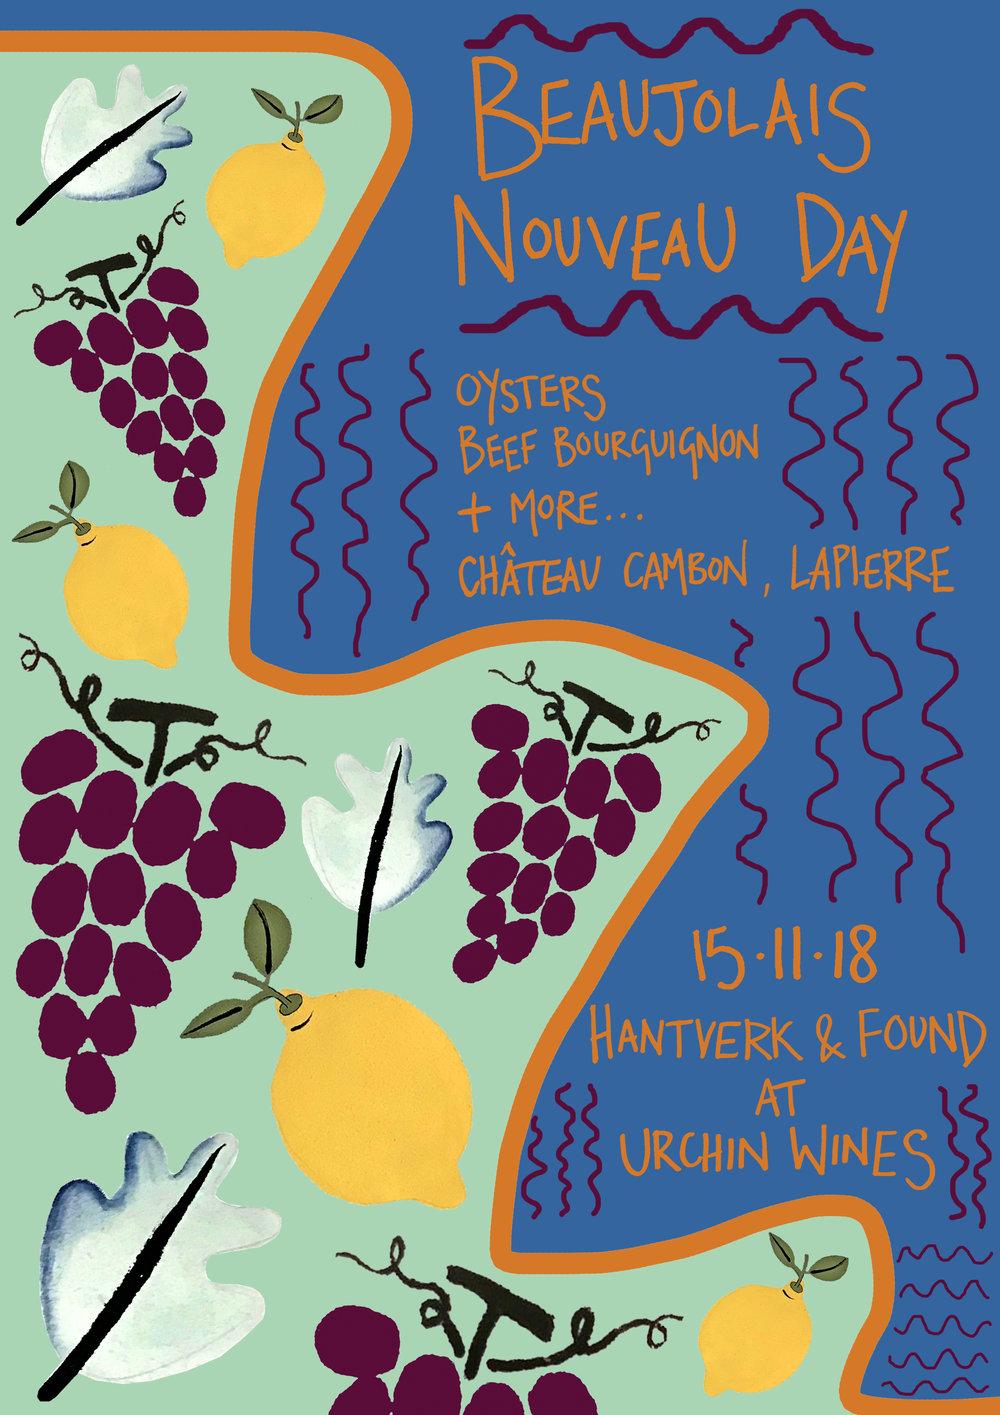 Beaujolais Nouveau Day Hantverk Urchin RGB.jpg